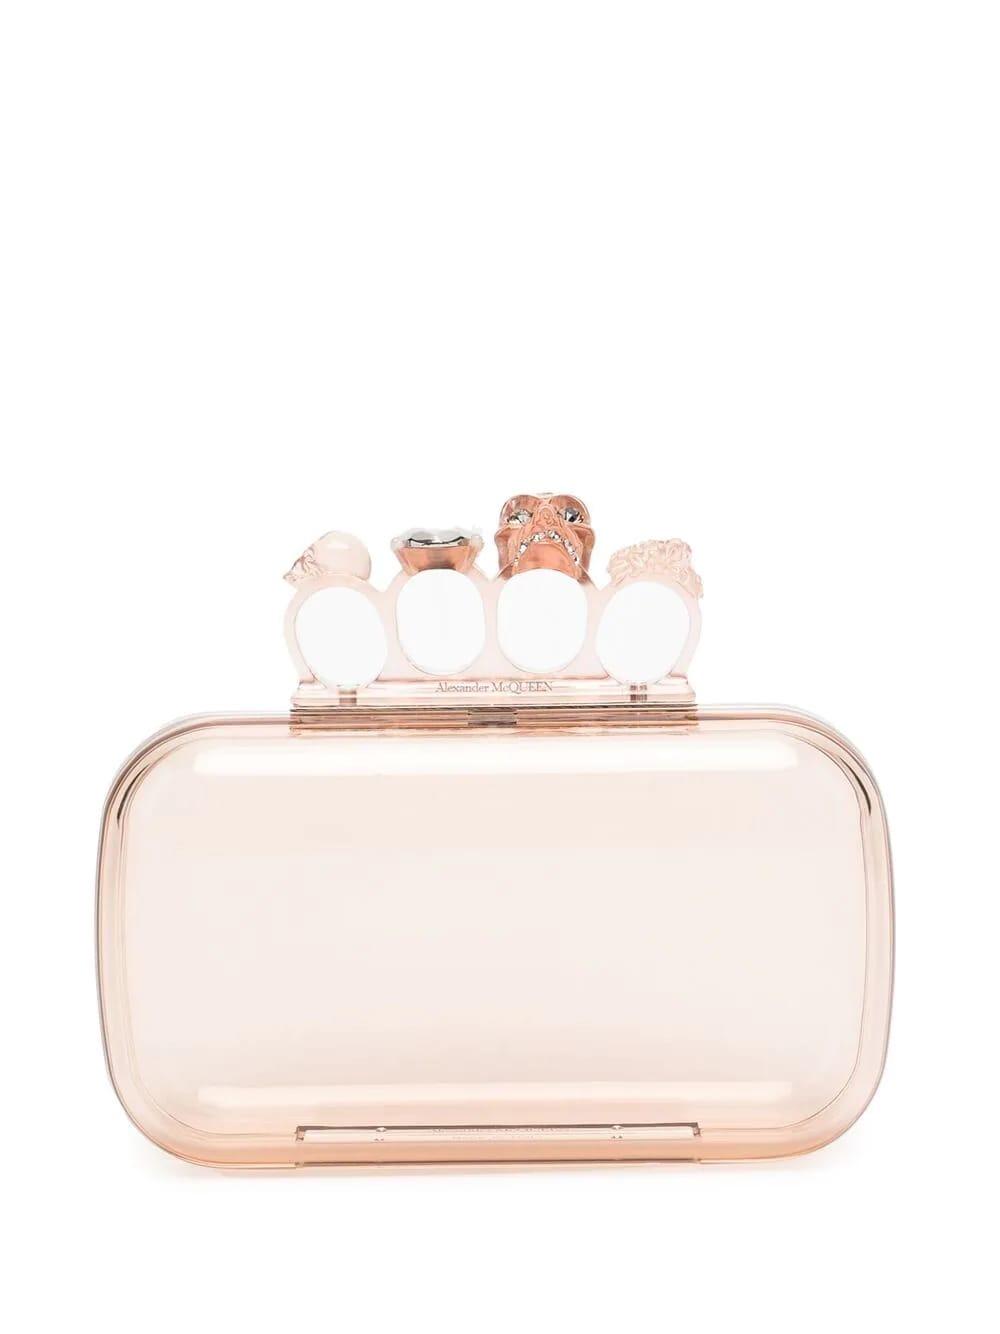 Alexander McQueen Transparent Pink Four-ring Skull Clutch